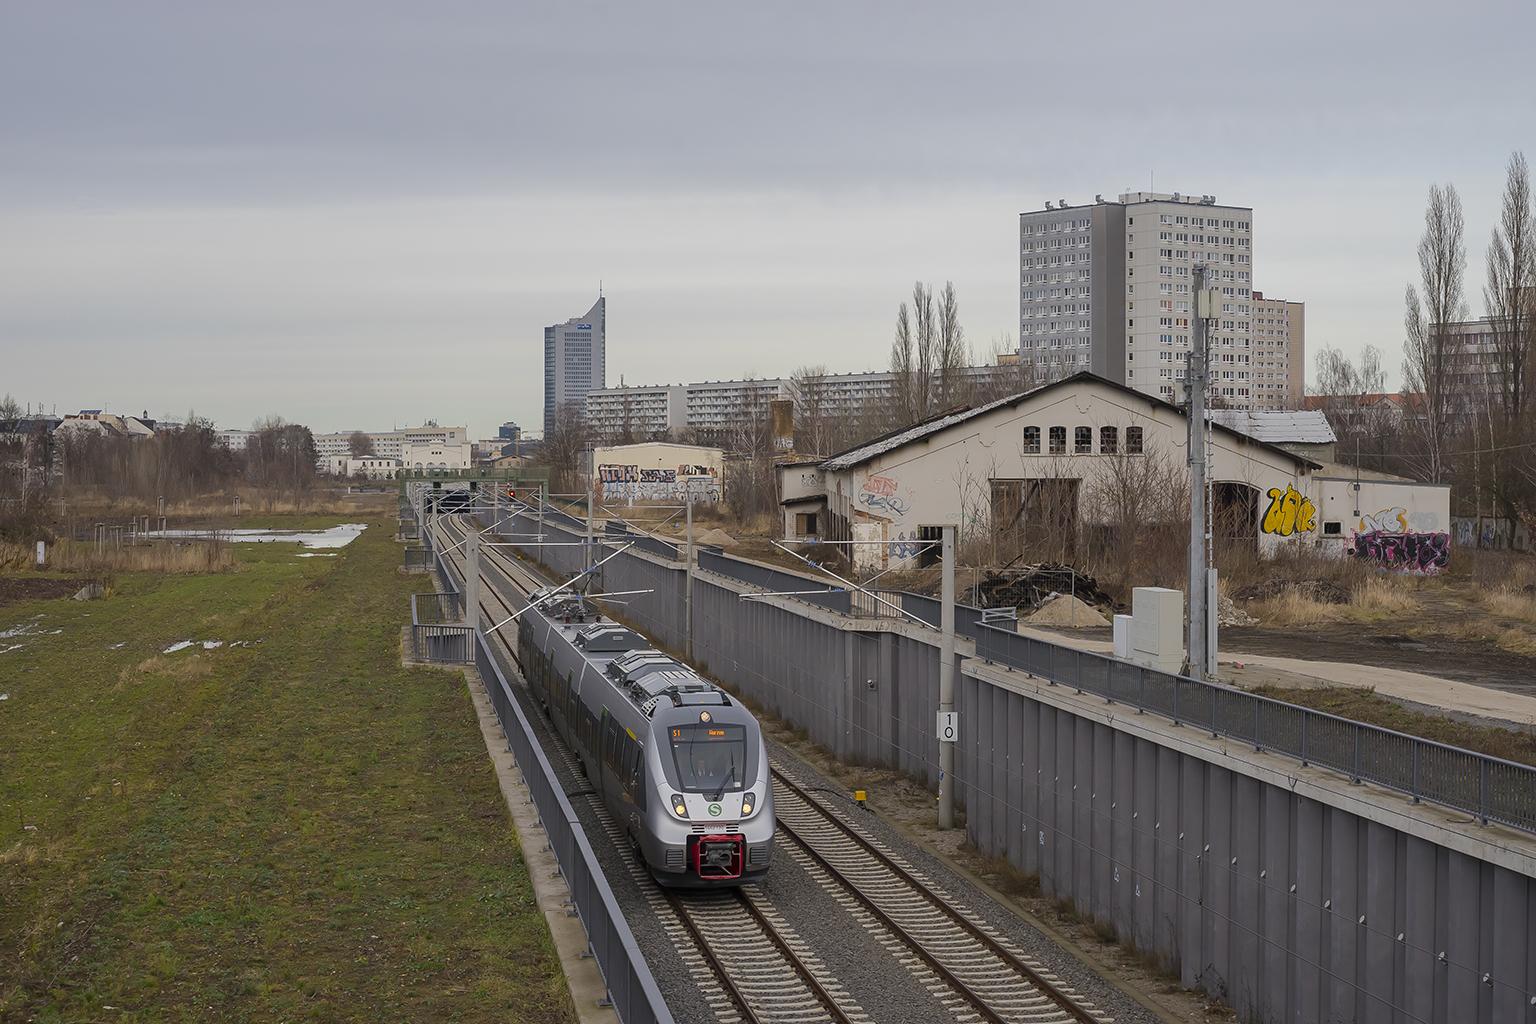 1442 130 Leipzig 04012014 dvd0029 075